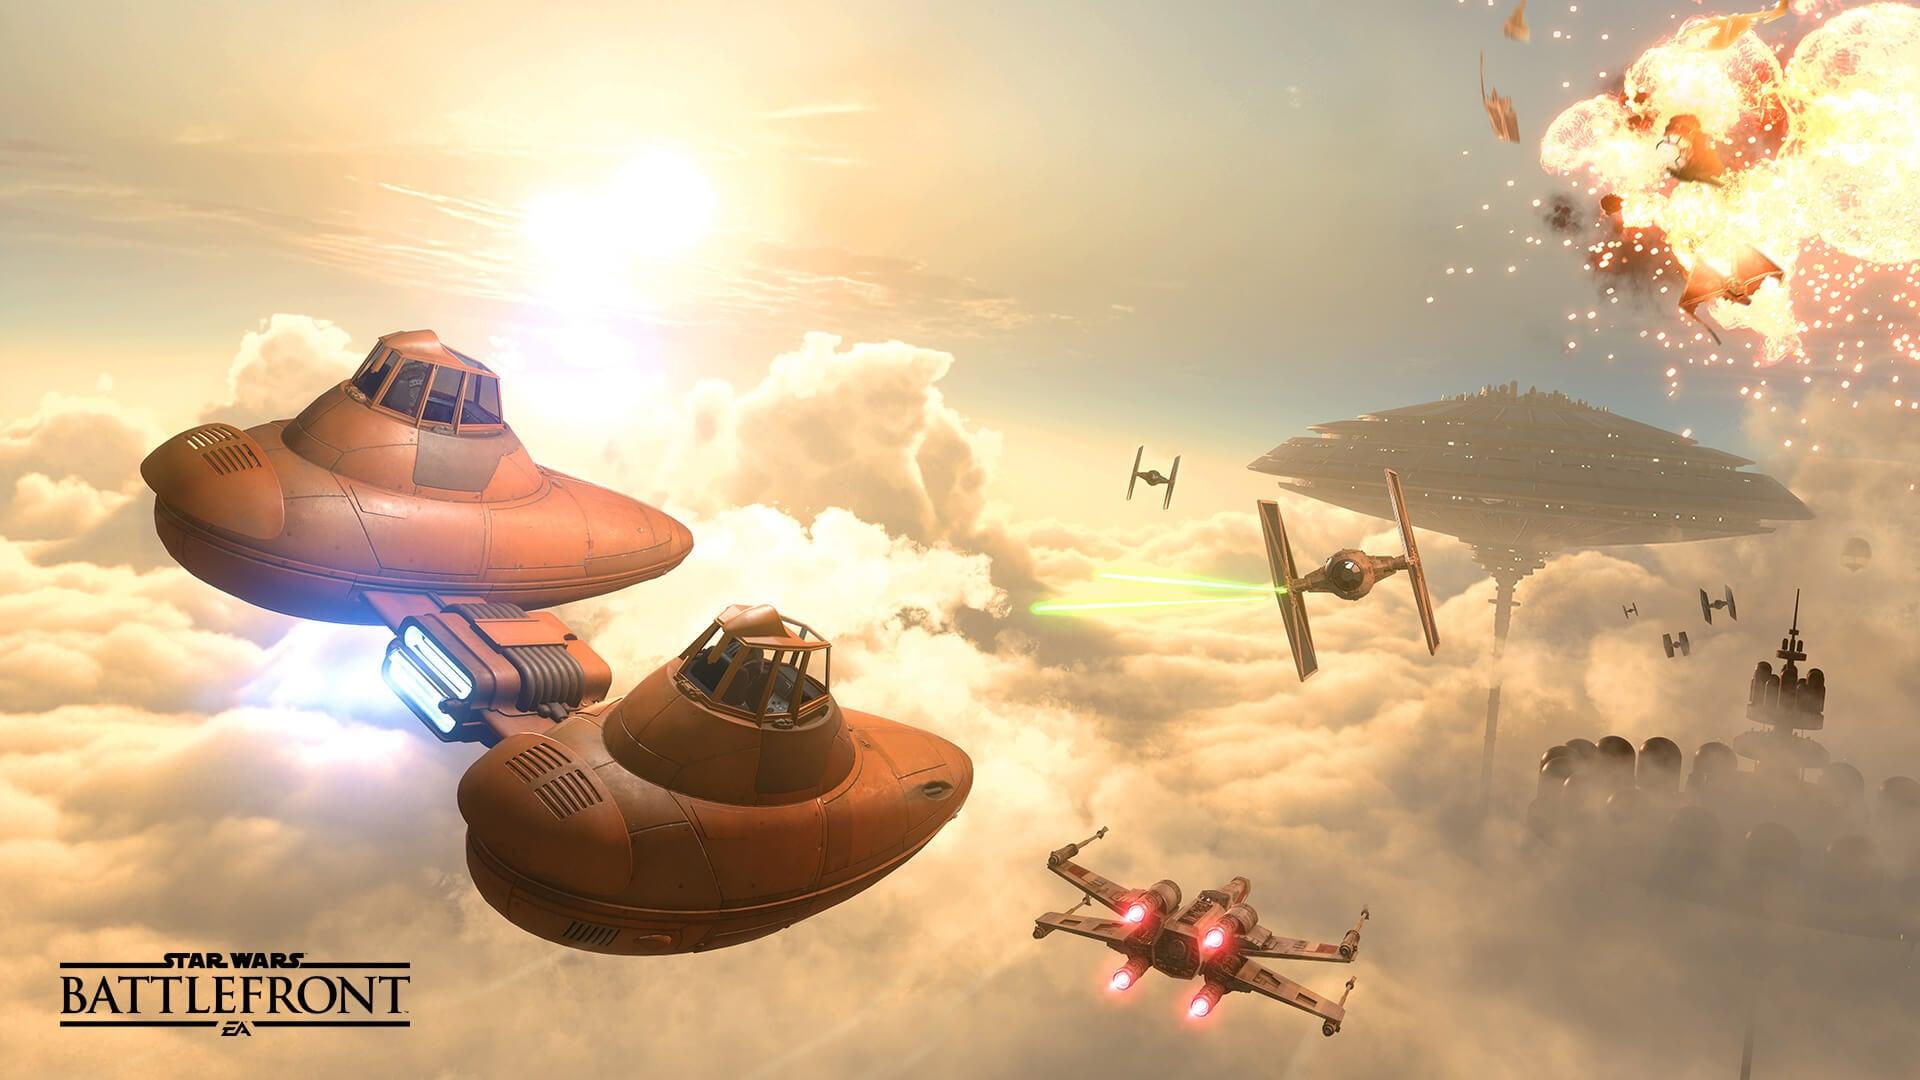 star wars battlefront ii wookieepedia fandom powered